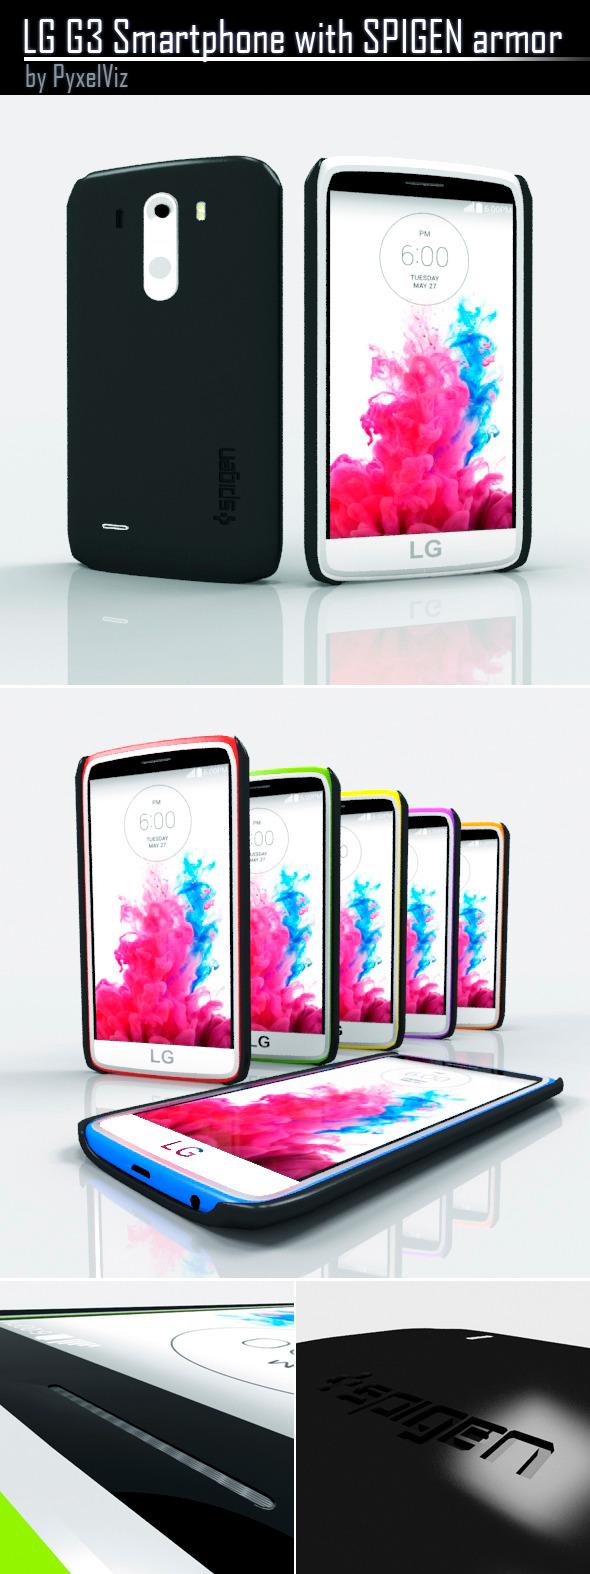 LG G3 Smartphone in SPIGEN armor - 3DOcean Item for Sale